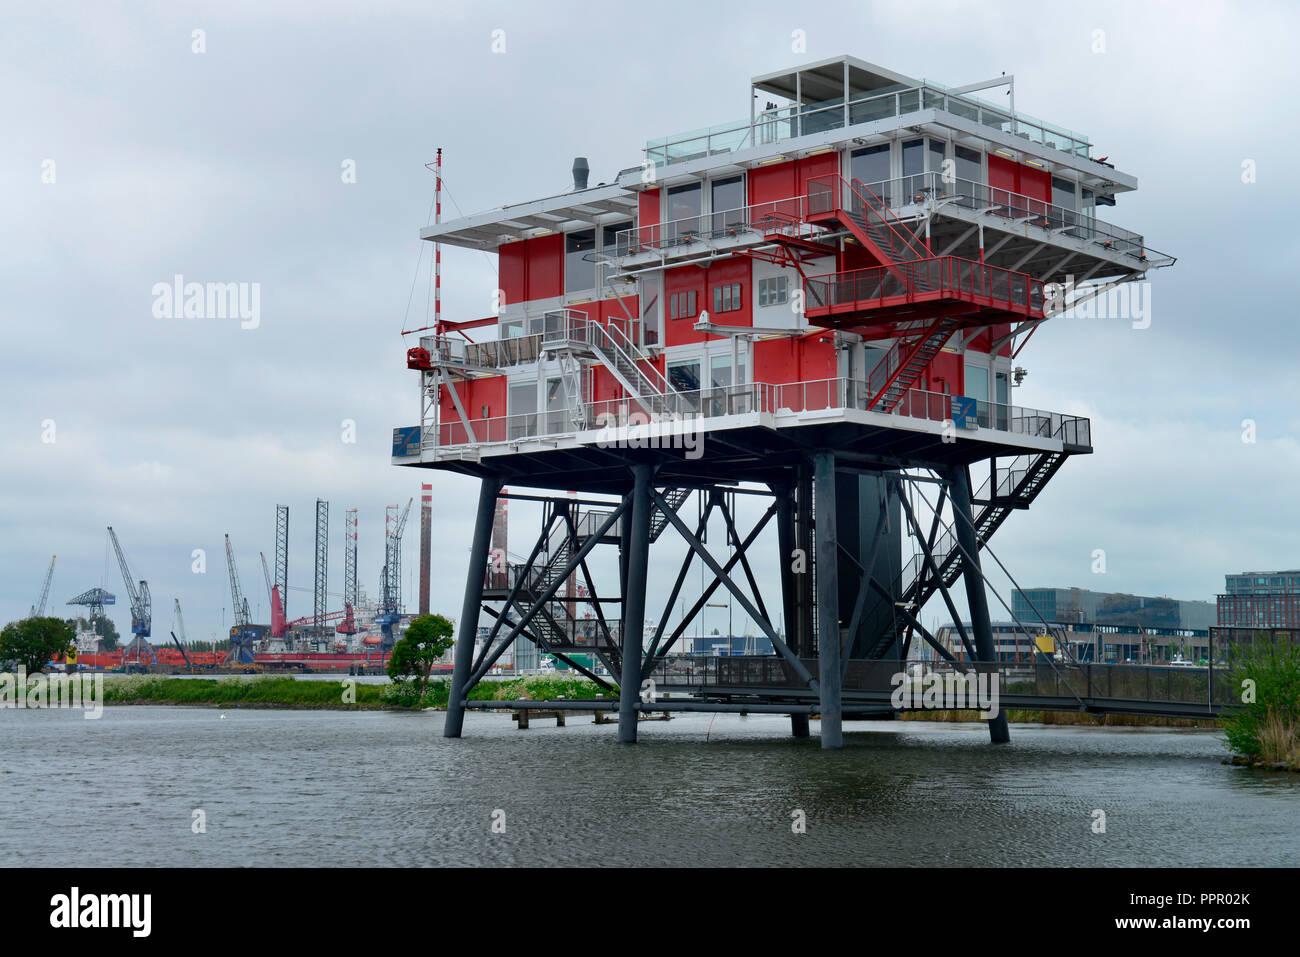 REM Eiland, Haparandadam, Amsterdam, Niederlande - Stock Image